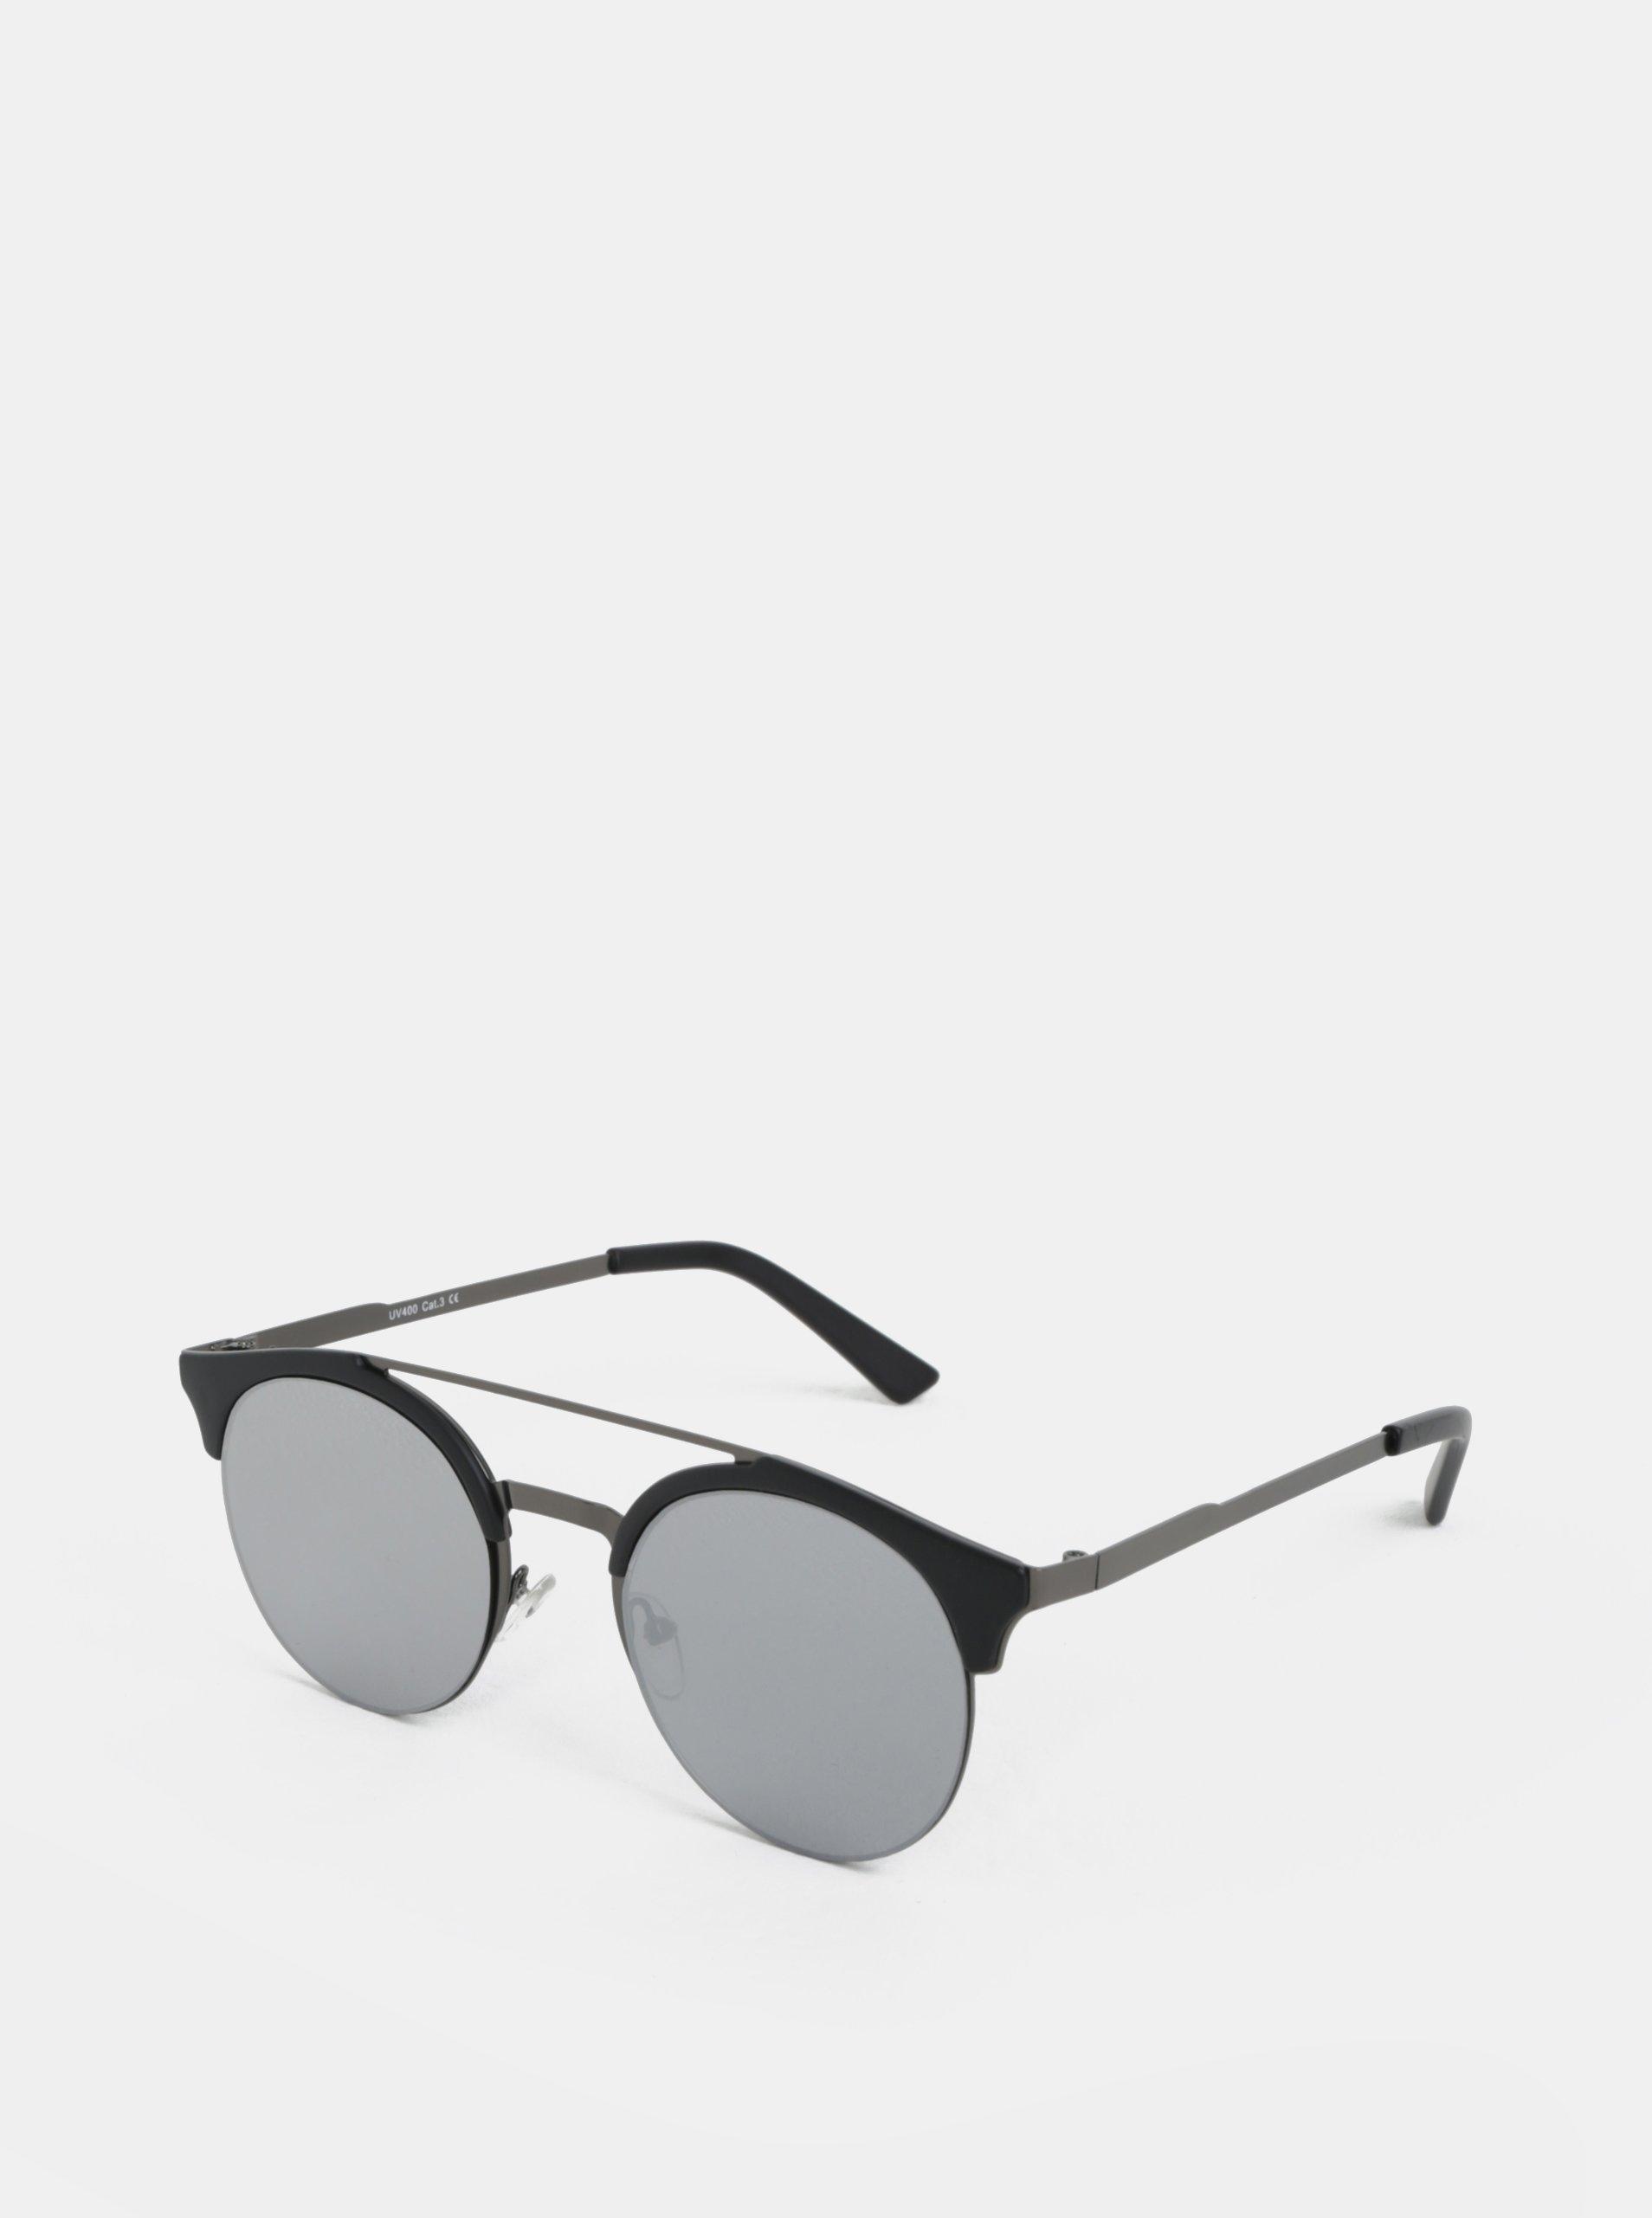 Čierne okrúhle slnečné okuliare ONLY   SONS Display  68070c8085c